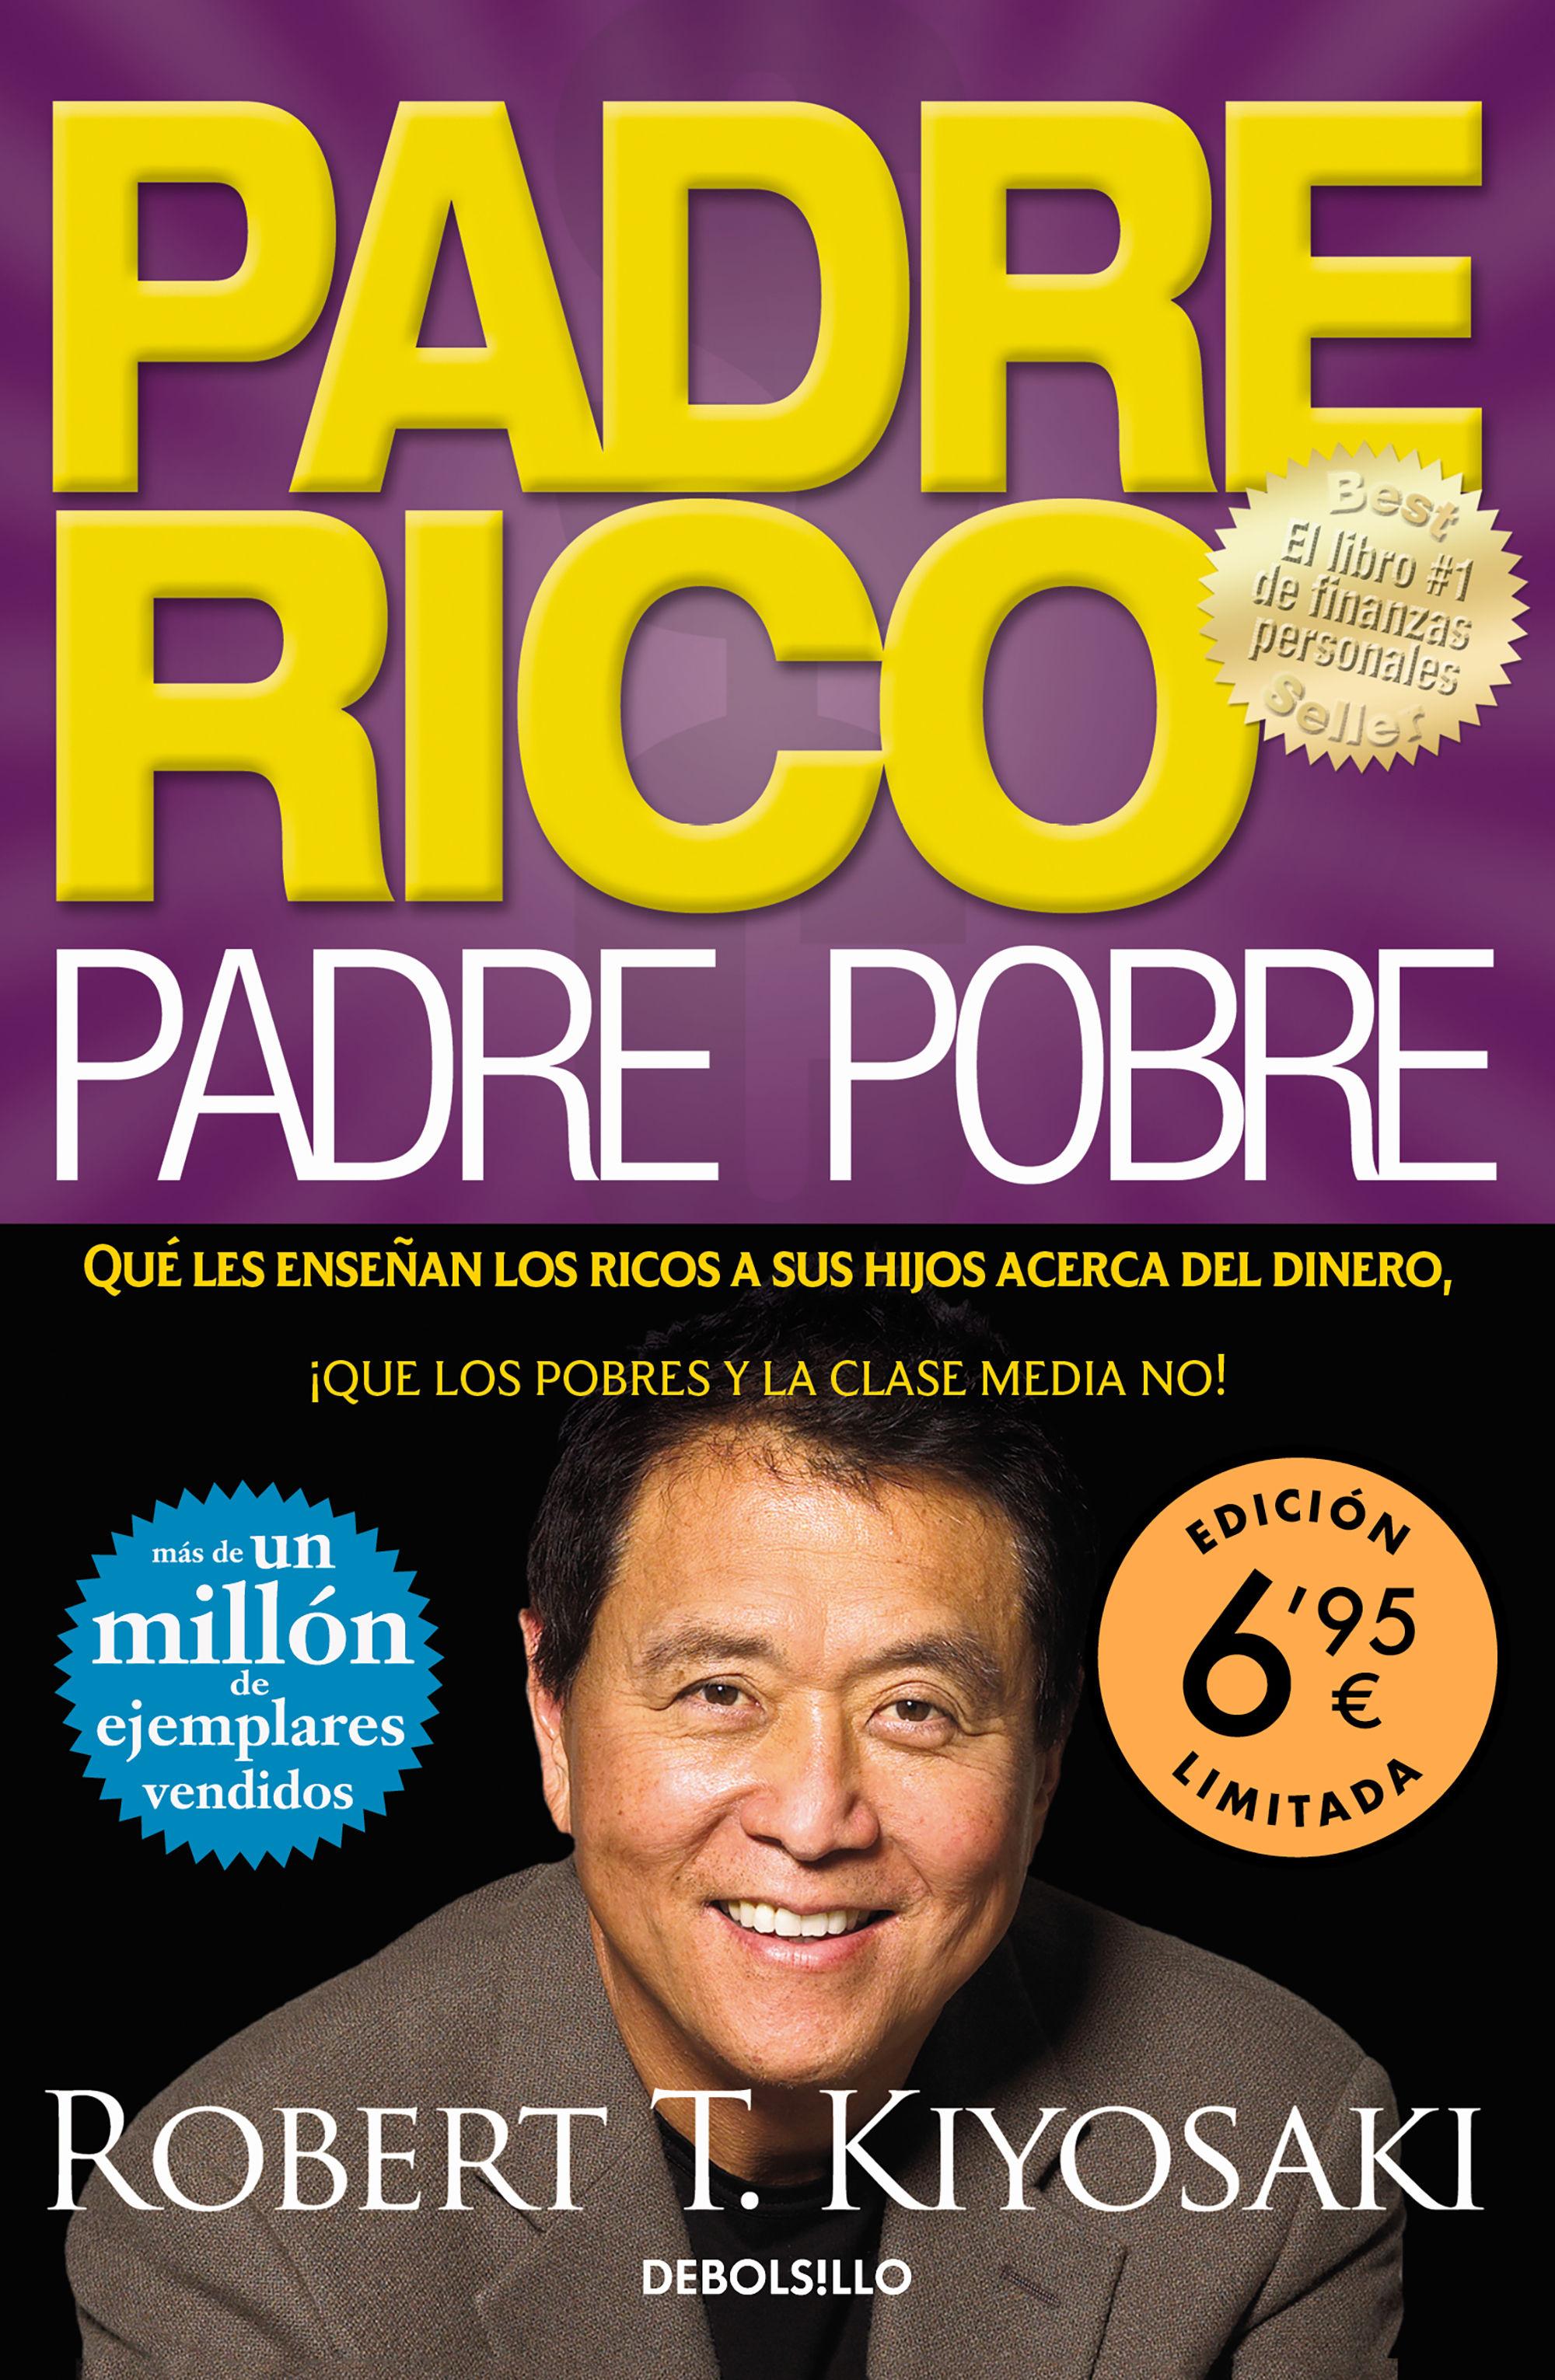 PADRE RICO PADRE POBRE (LIMITED)